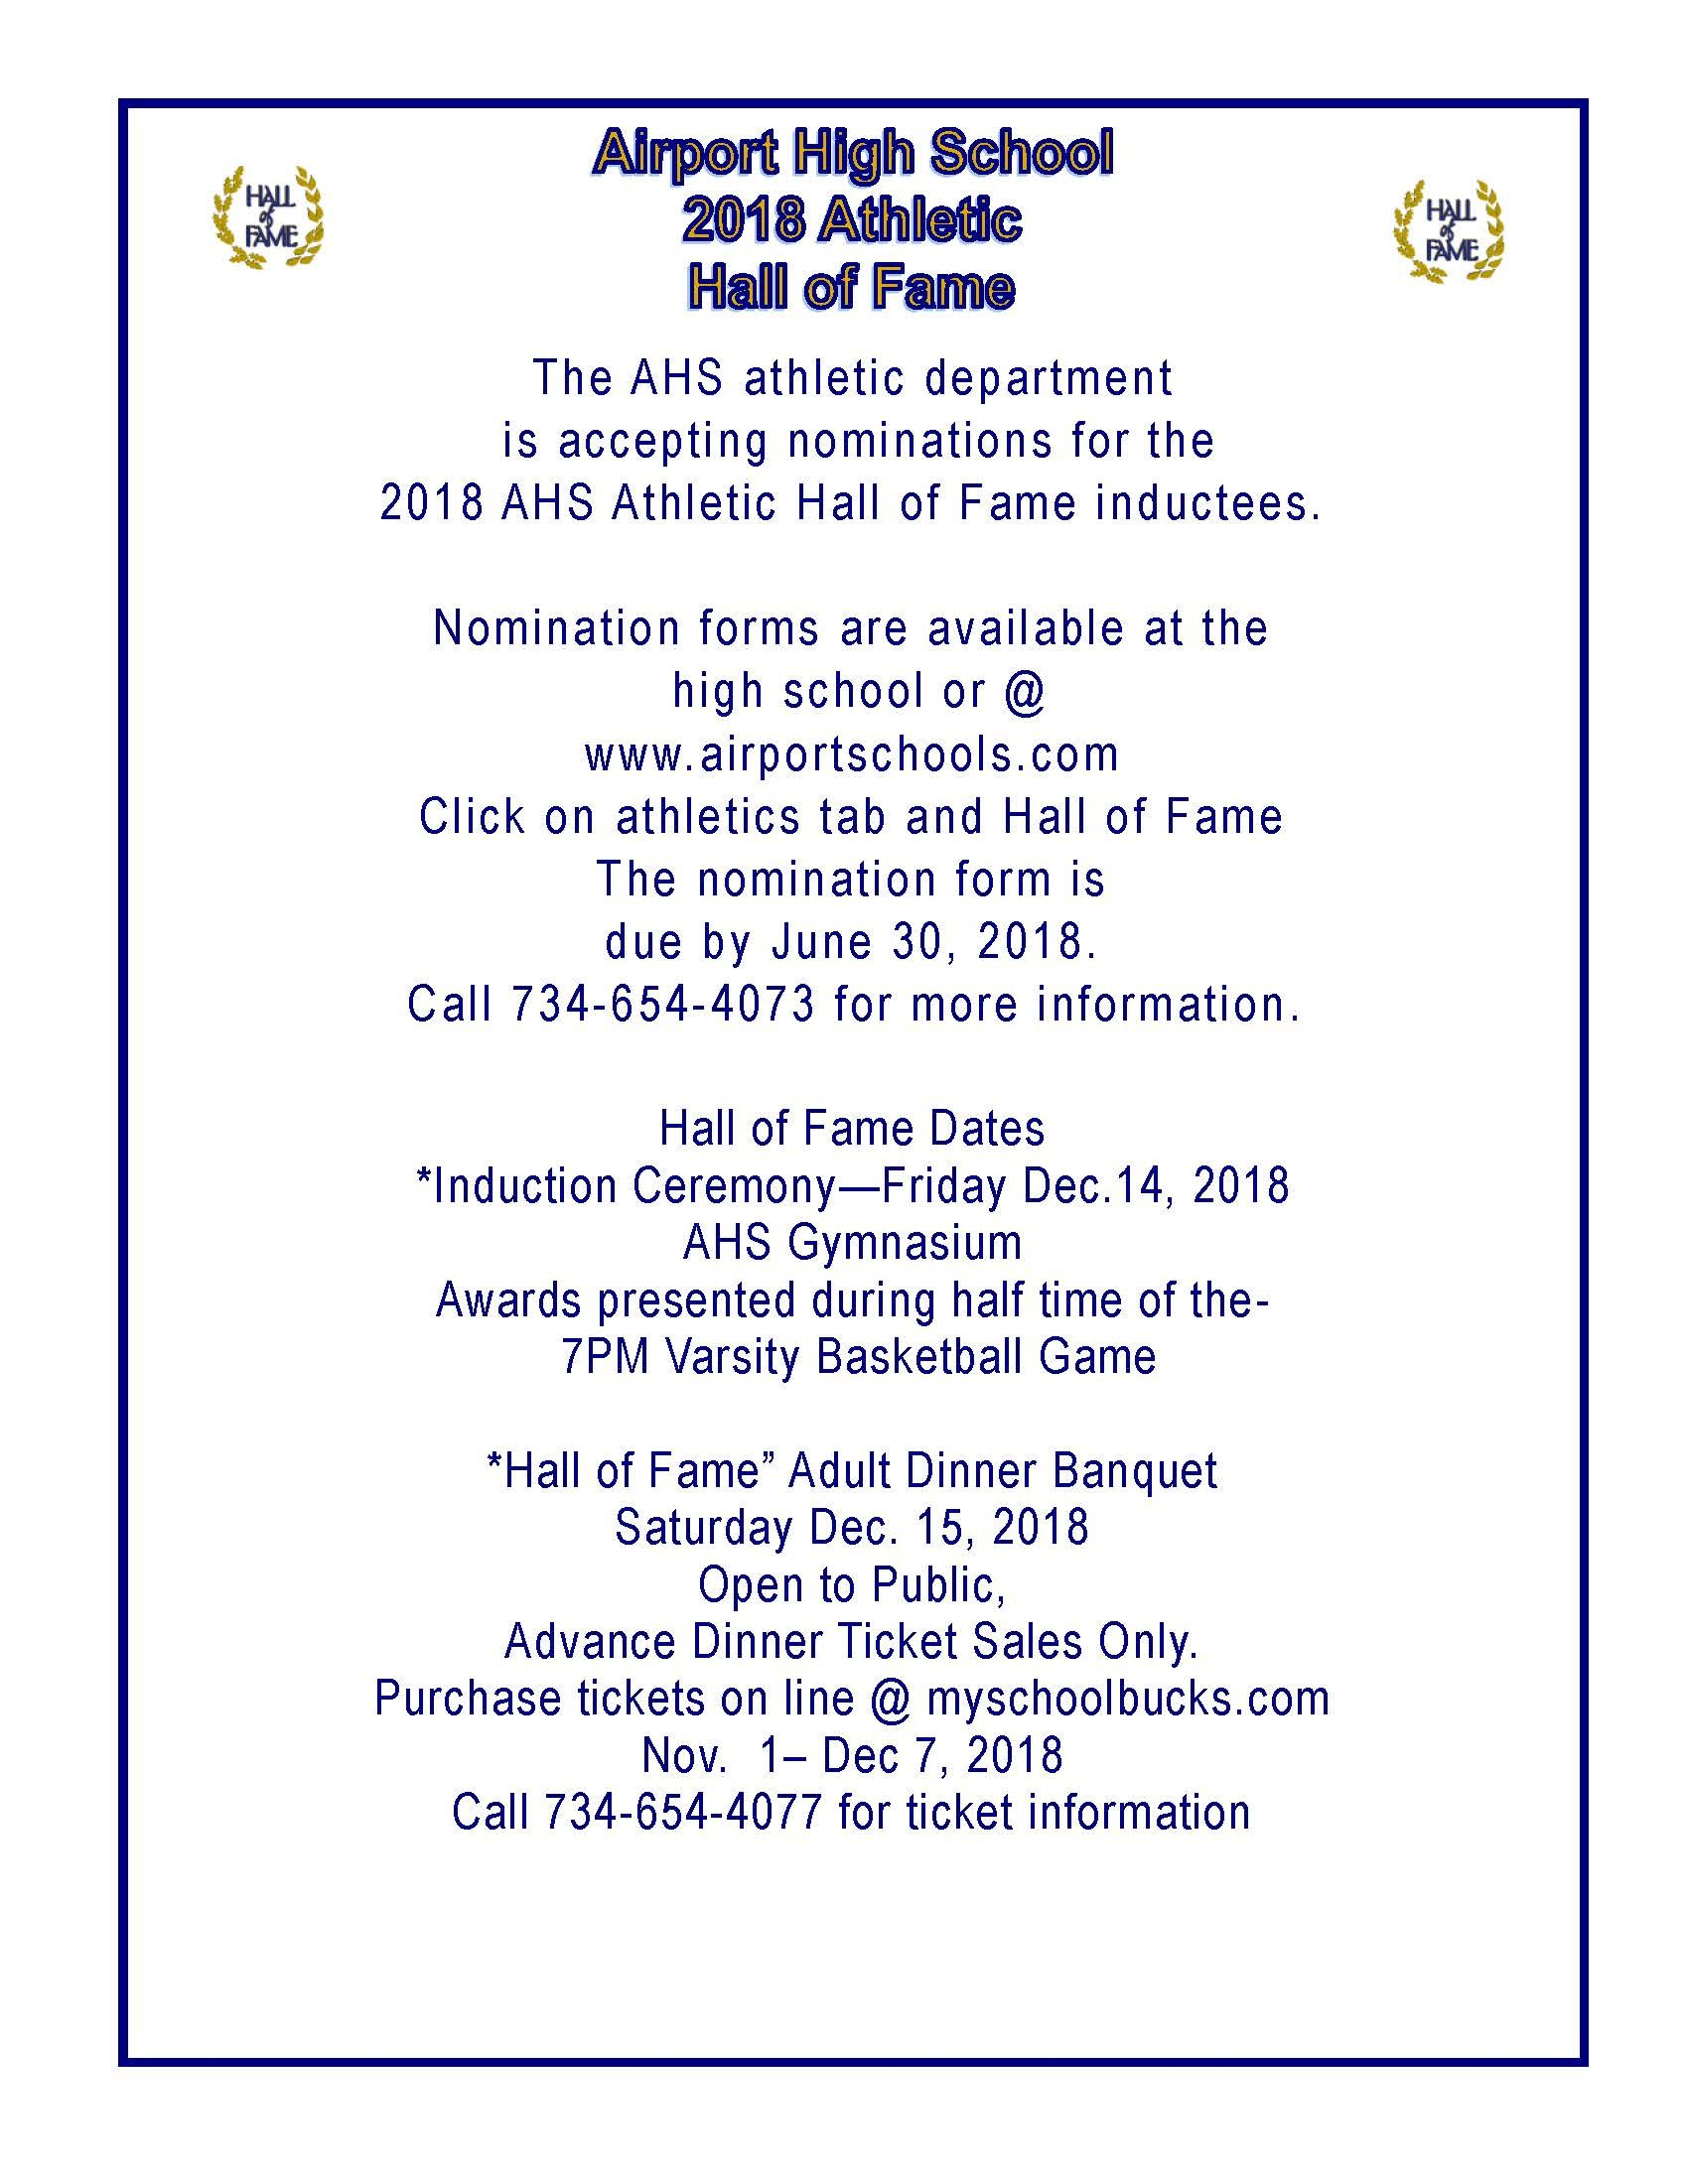 2018 Hall of Fame Information